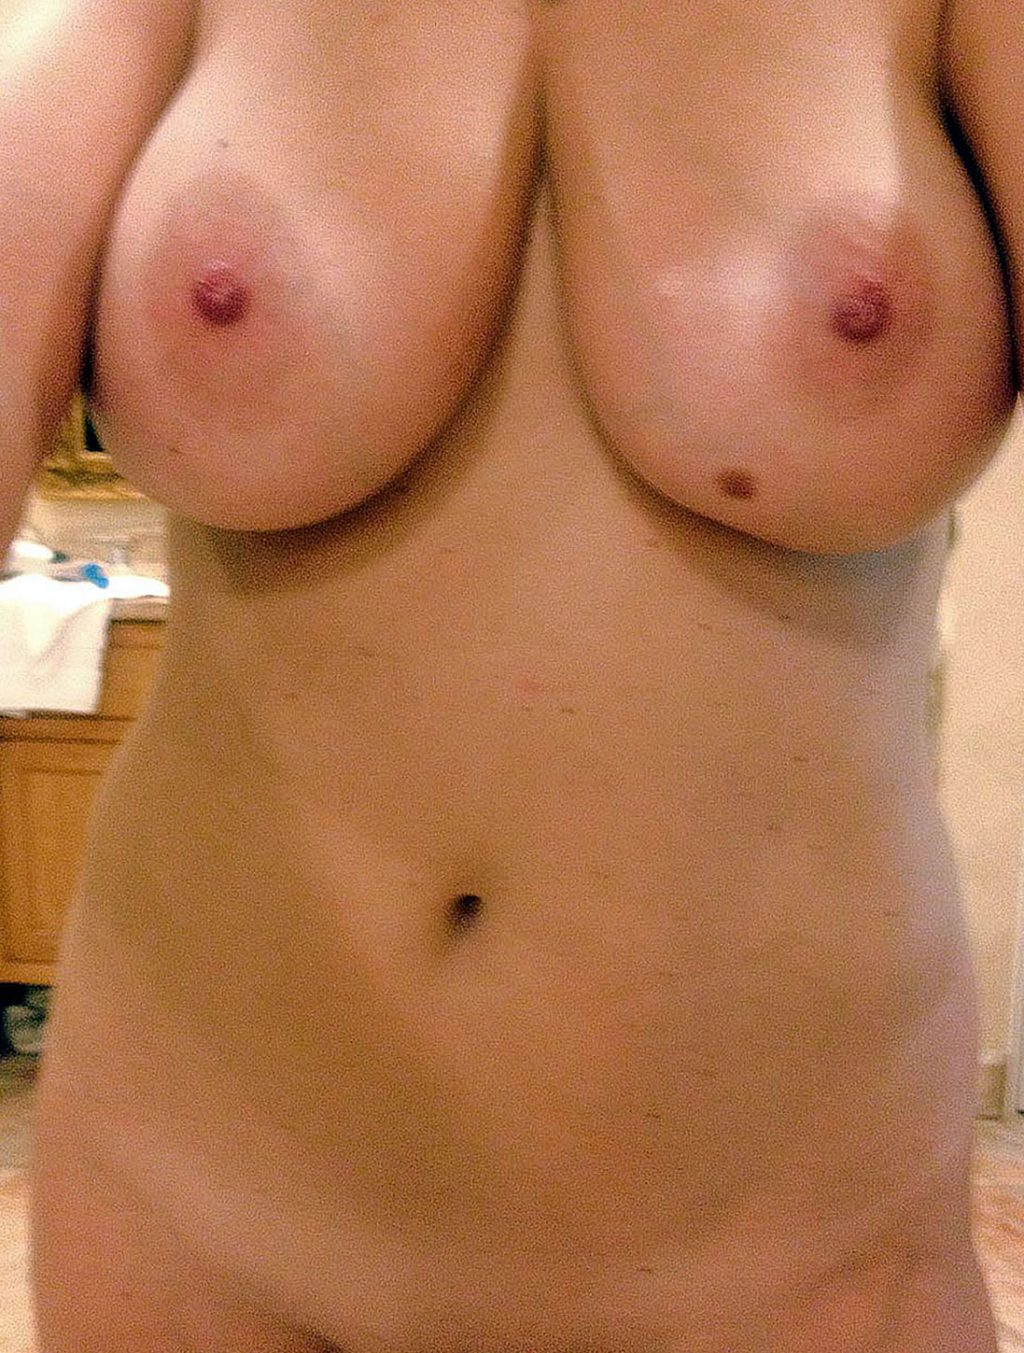 Kate Upton naked